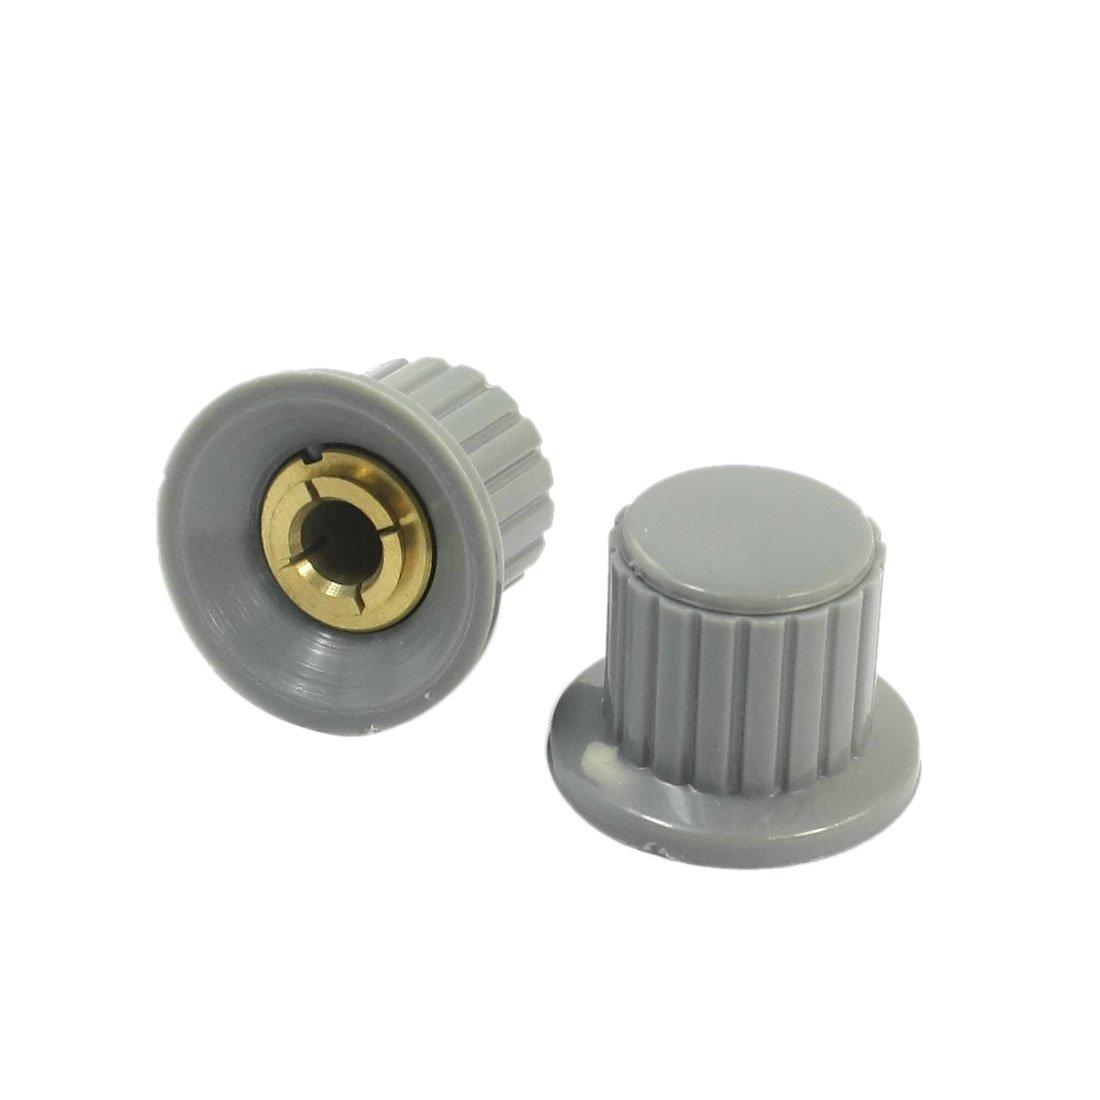 10Stk Potentiometer knob Grau-Weiß Für 6mm Shaft Pots Welle Töpfe